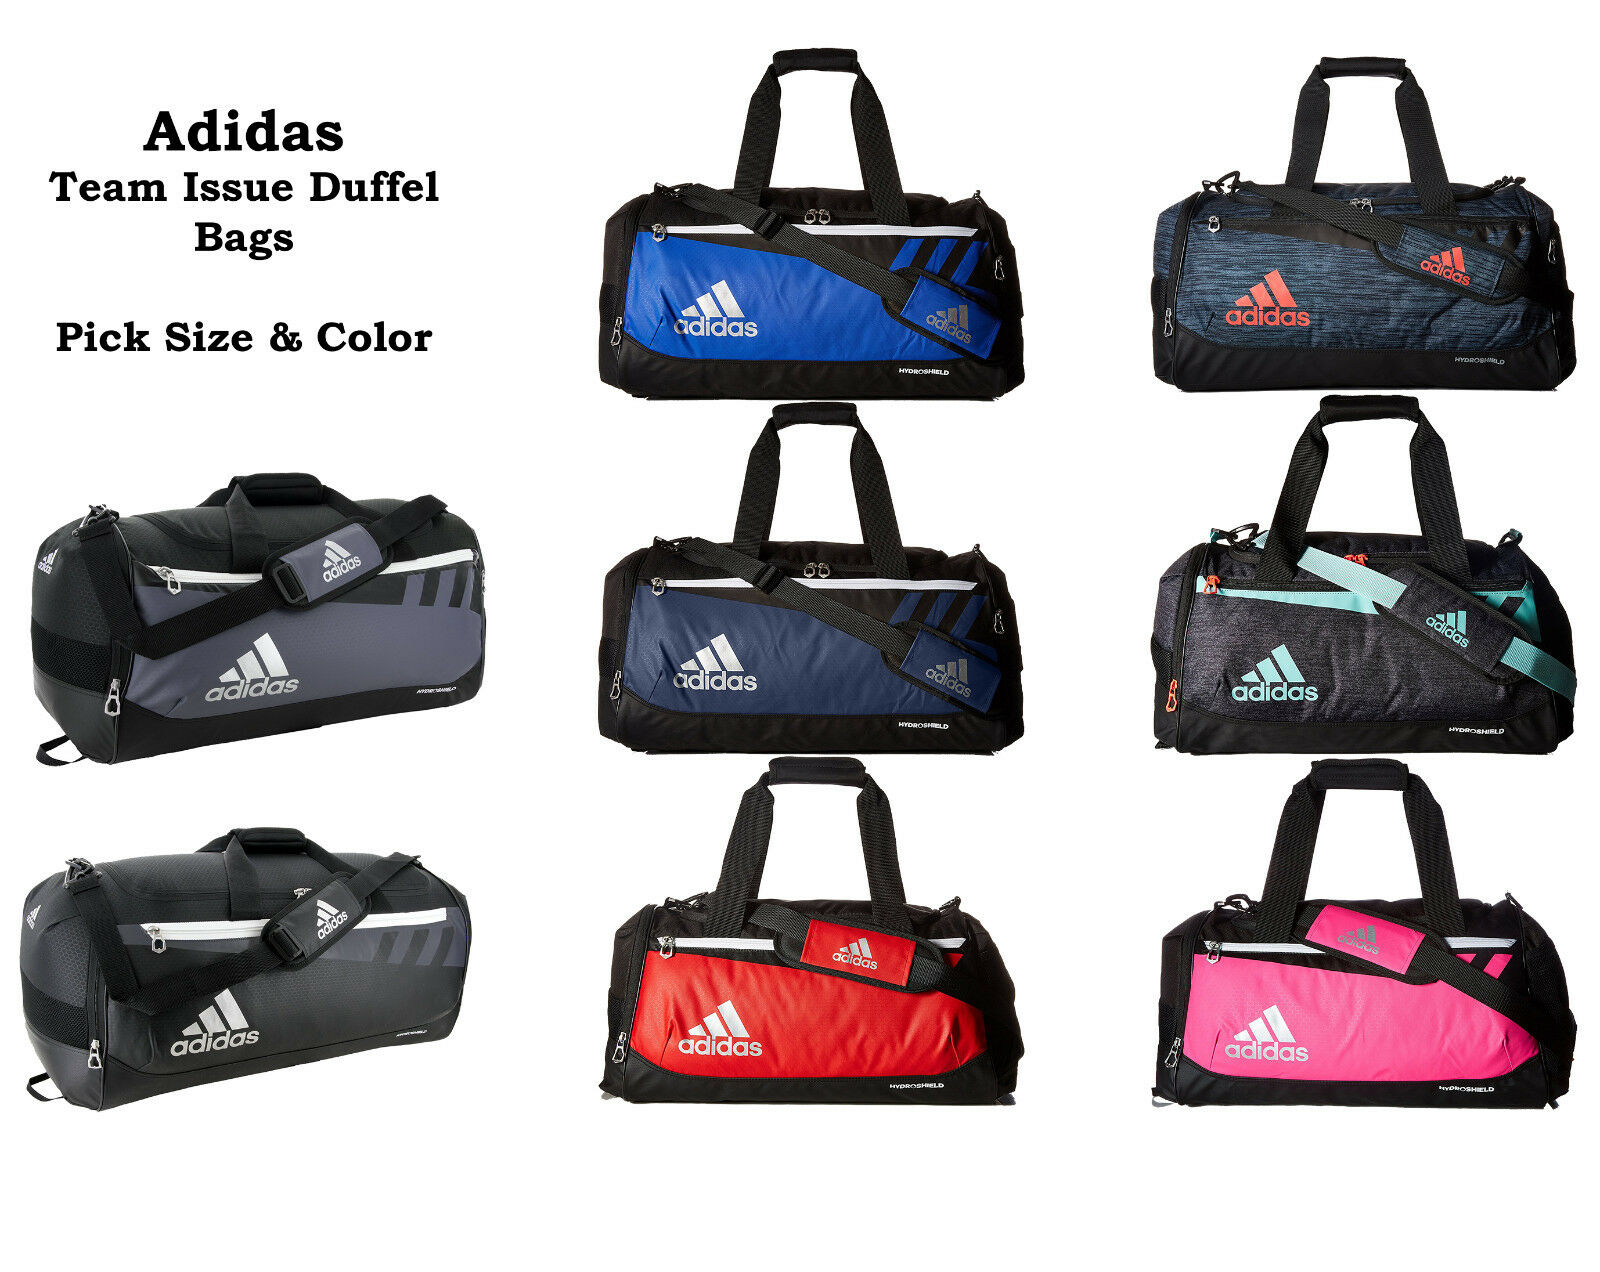 0a3a2c2bfac adidas Team Issue Medium Duffle 17 Colors Gym Duffel Blue Collegiate Navy  for sale online | eBay